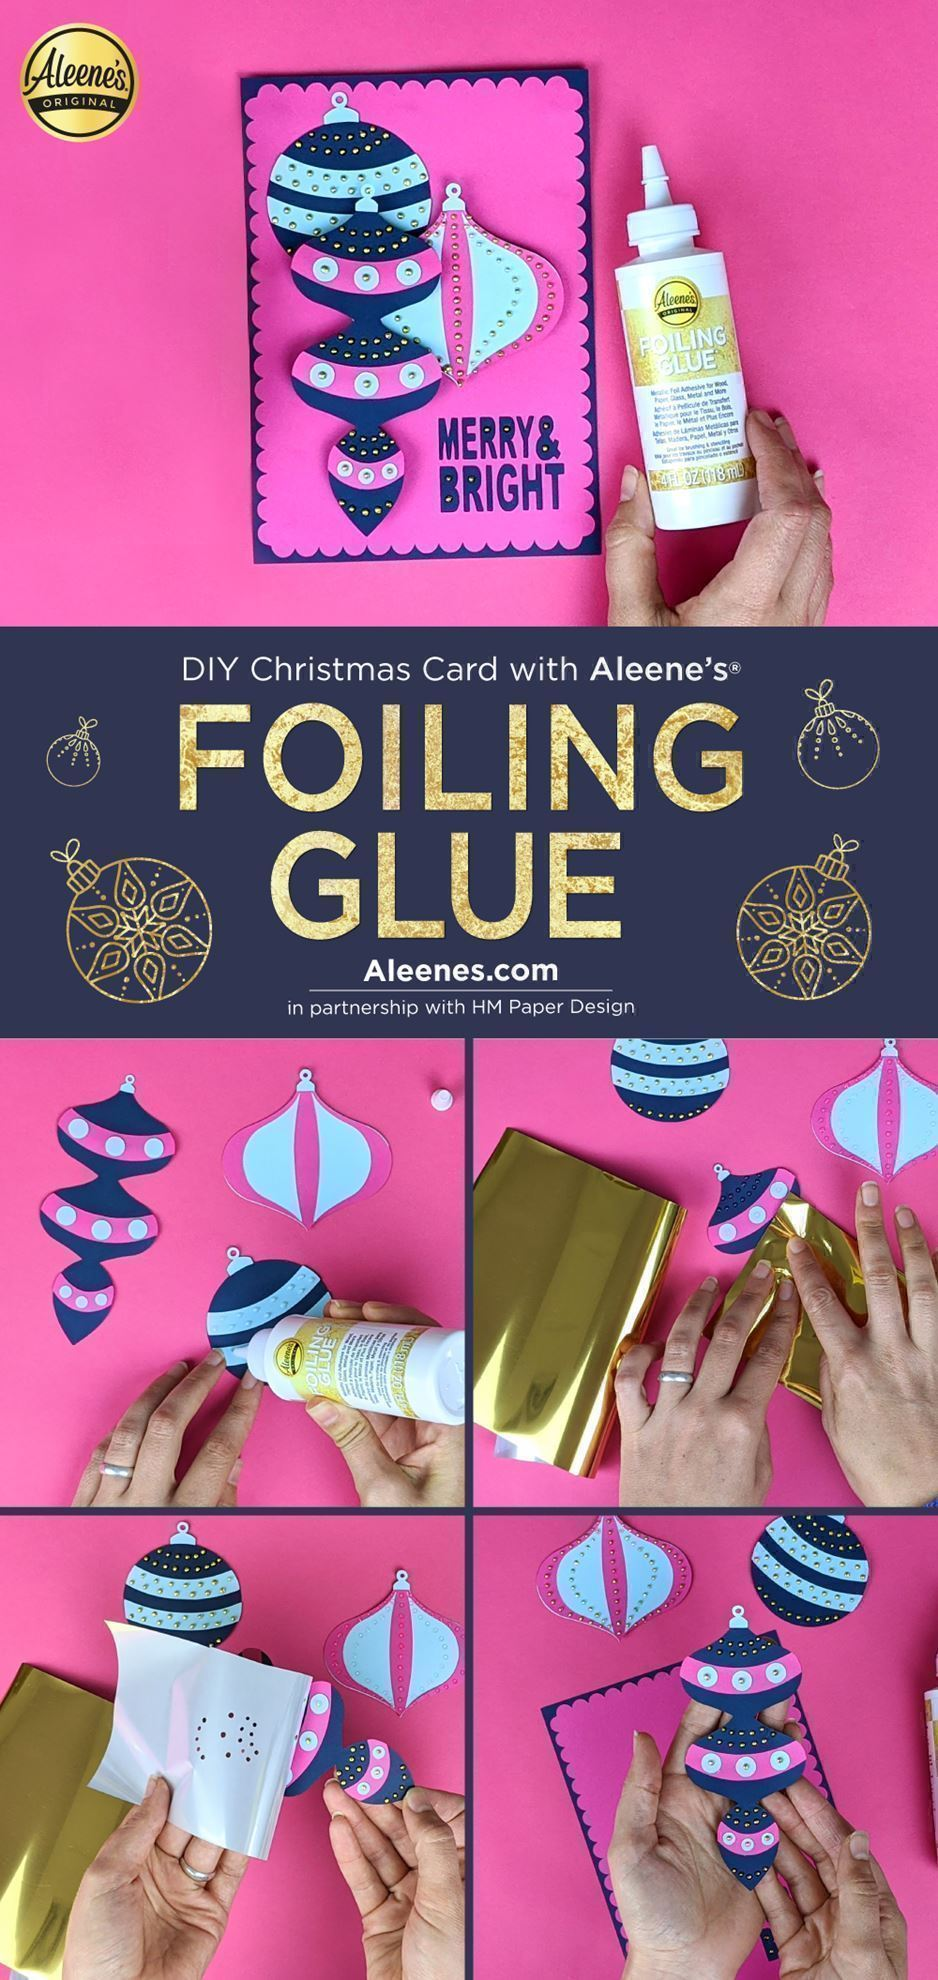 DIY Christmas Card Idea with Foiling Glue